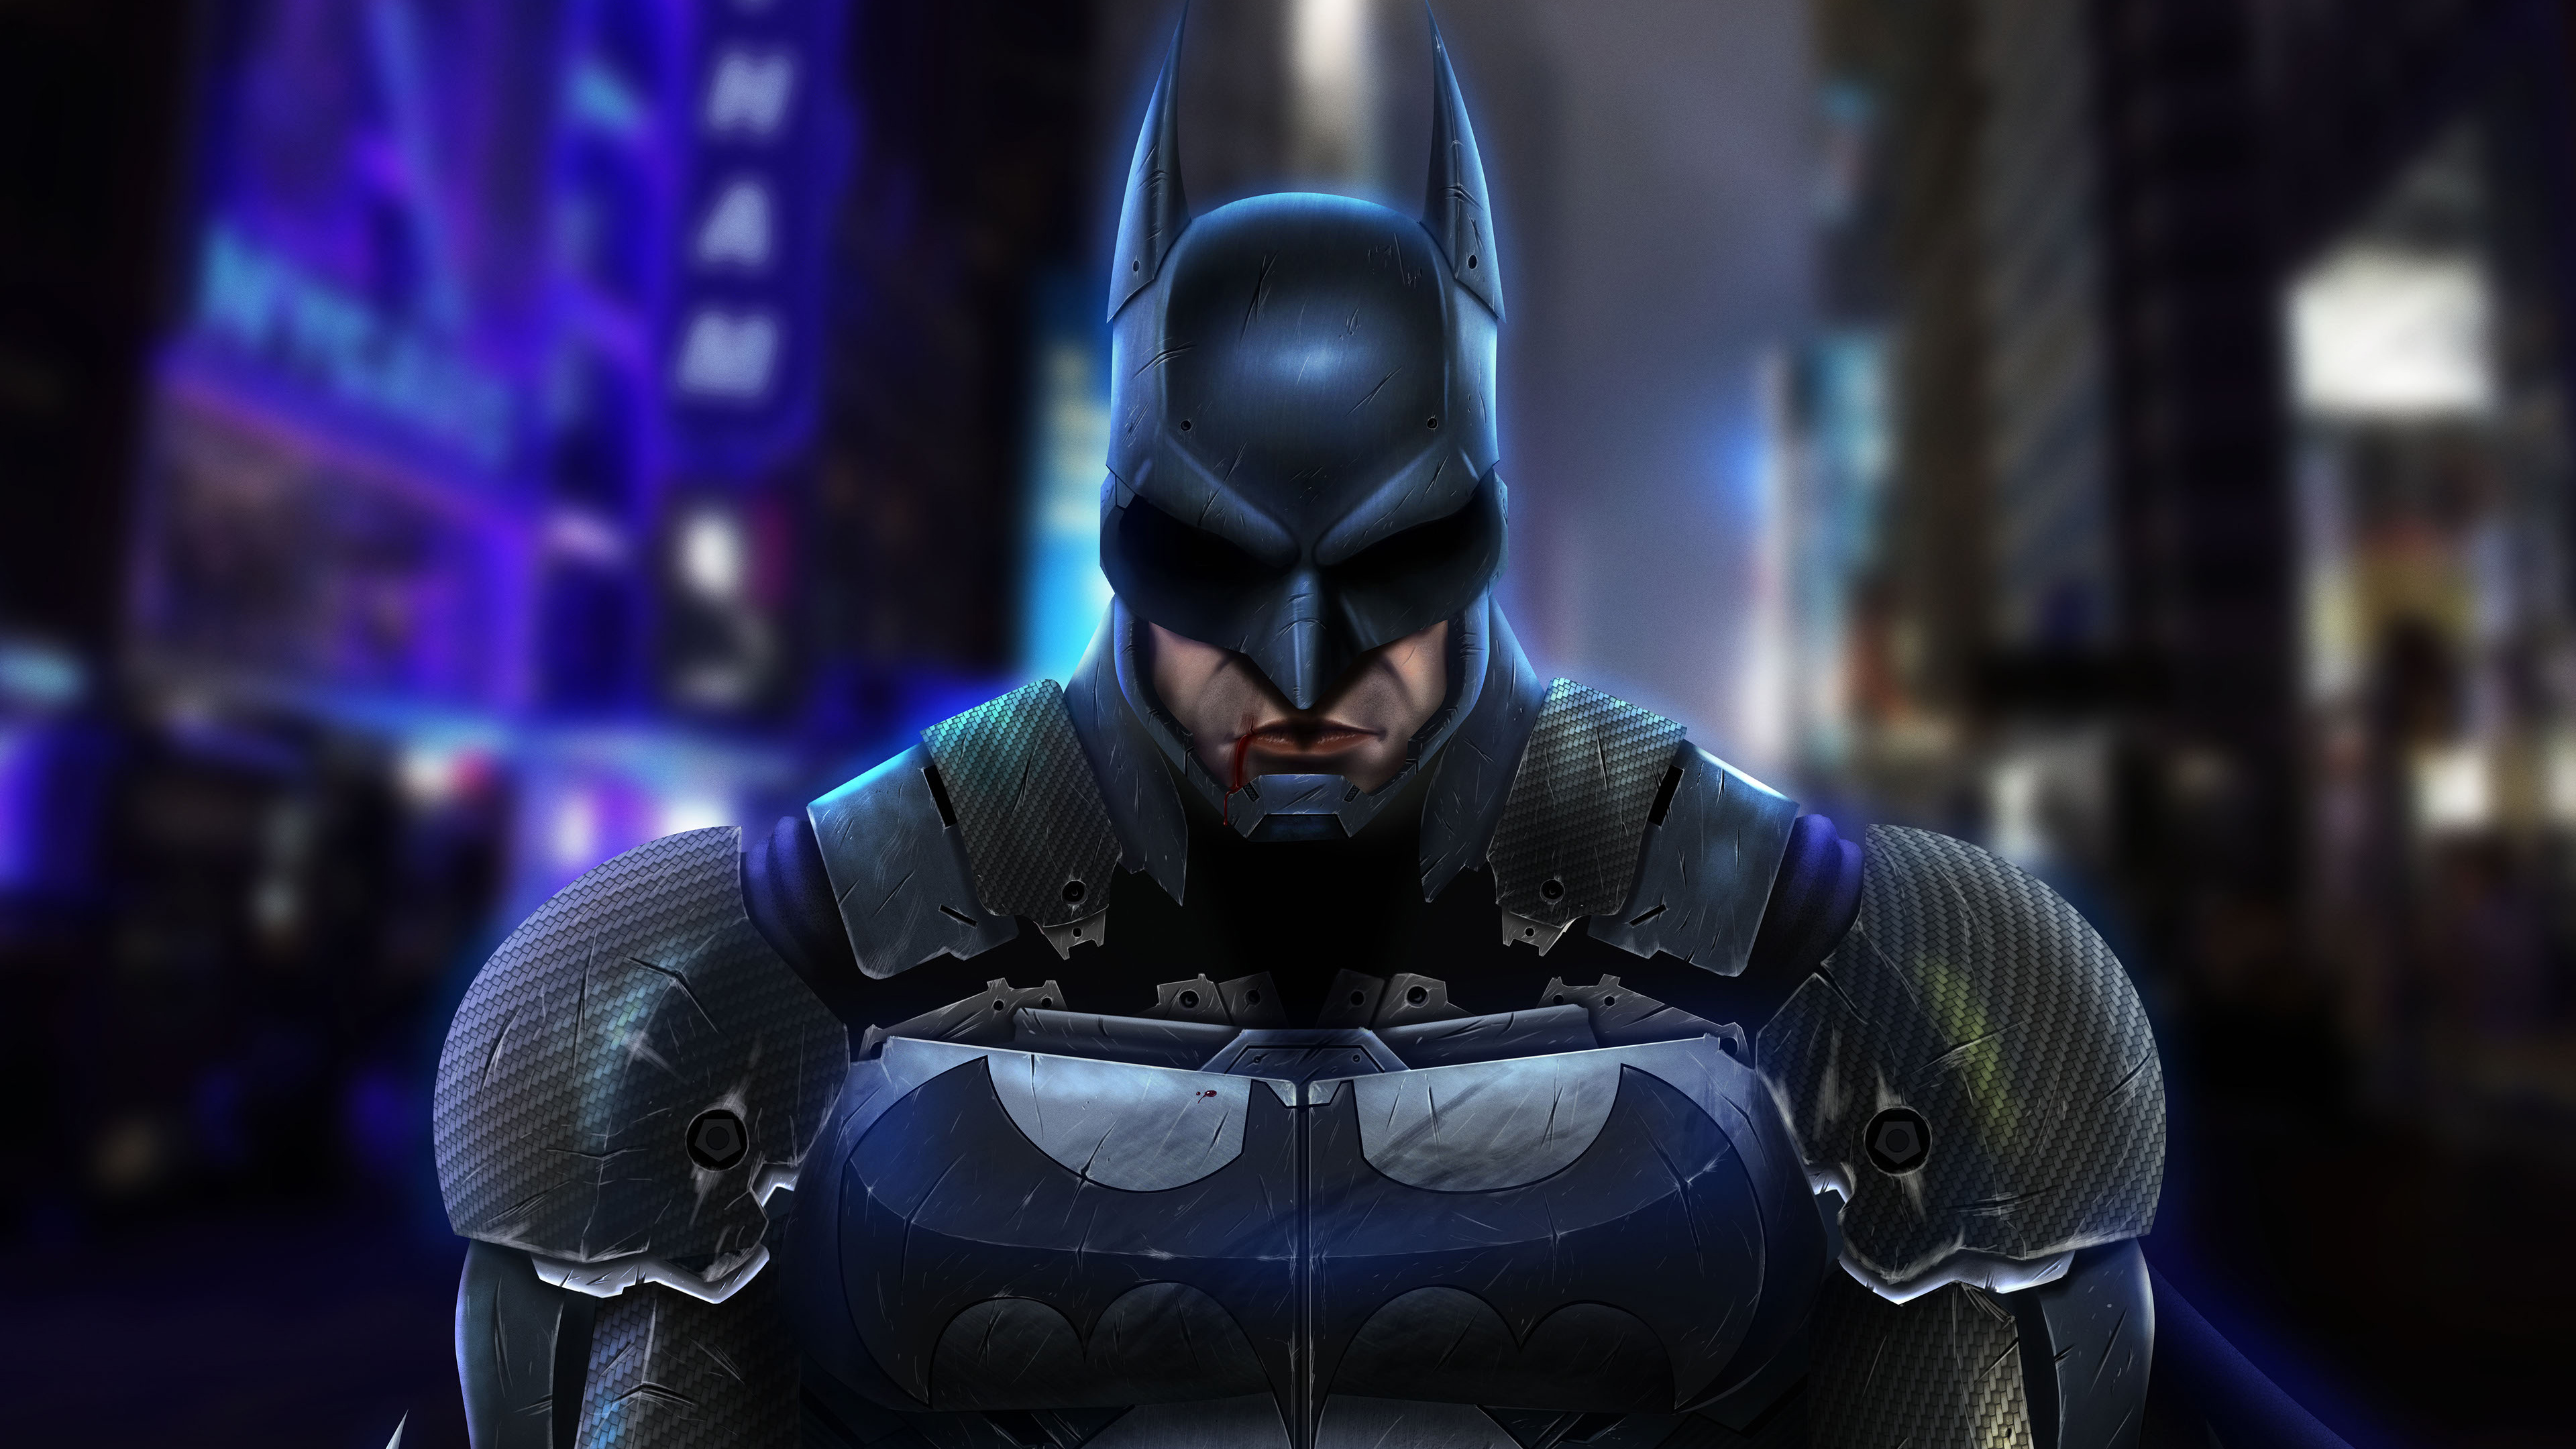 batman 4k new artwork 1543618780 - Batman 4k New Artwork - superheroes wallpapers, portrait wallpapers, hd-wallpapers, digital art wallpapers, batman wallpapers, artwork wallpapers, 4k-wallpapers